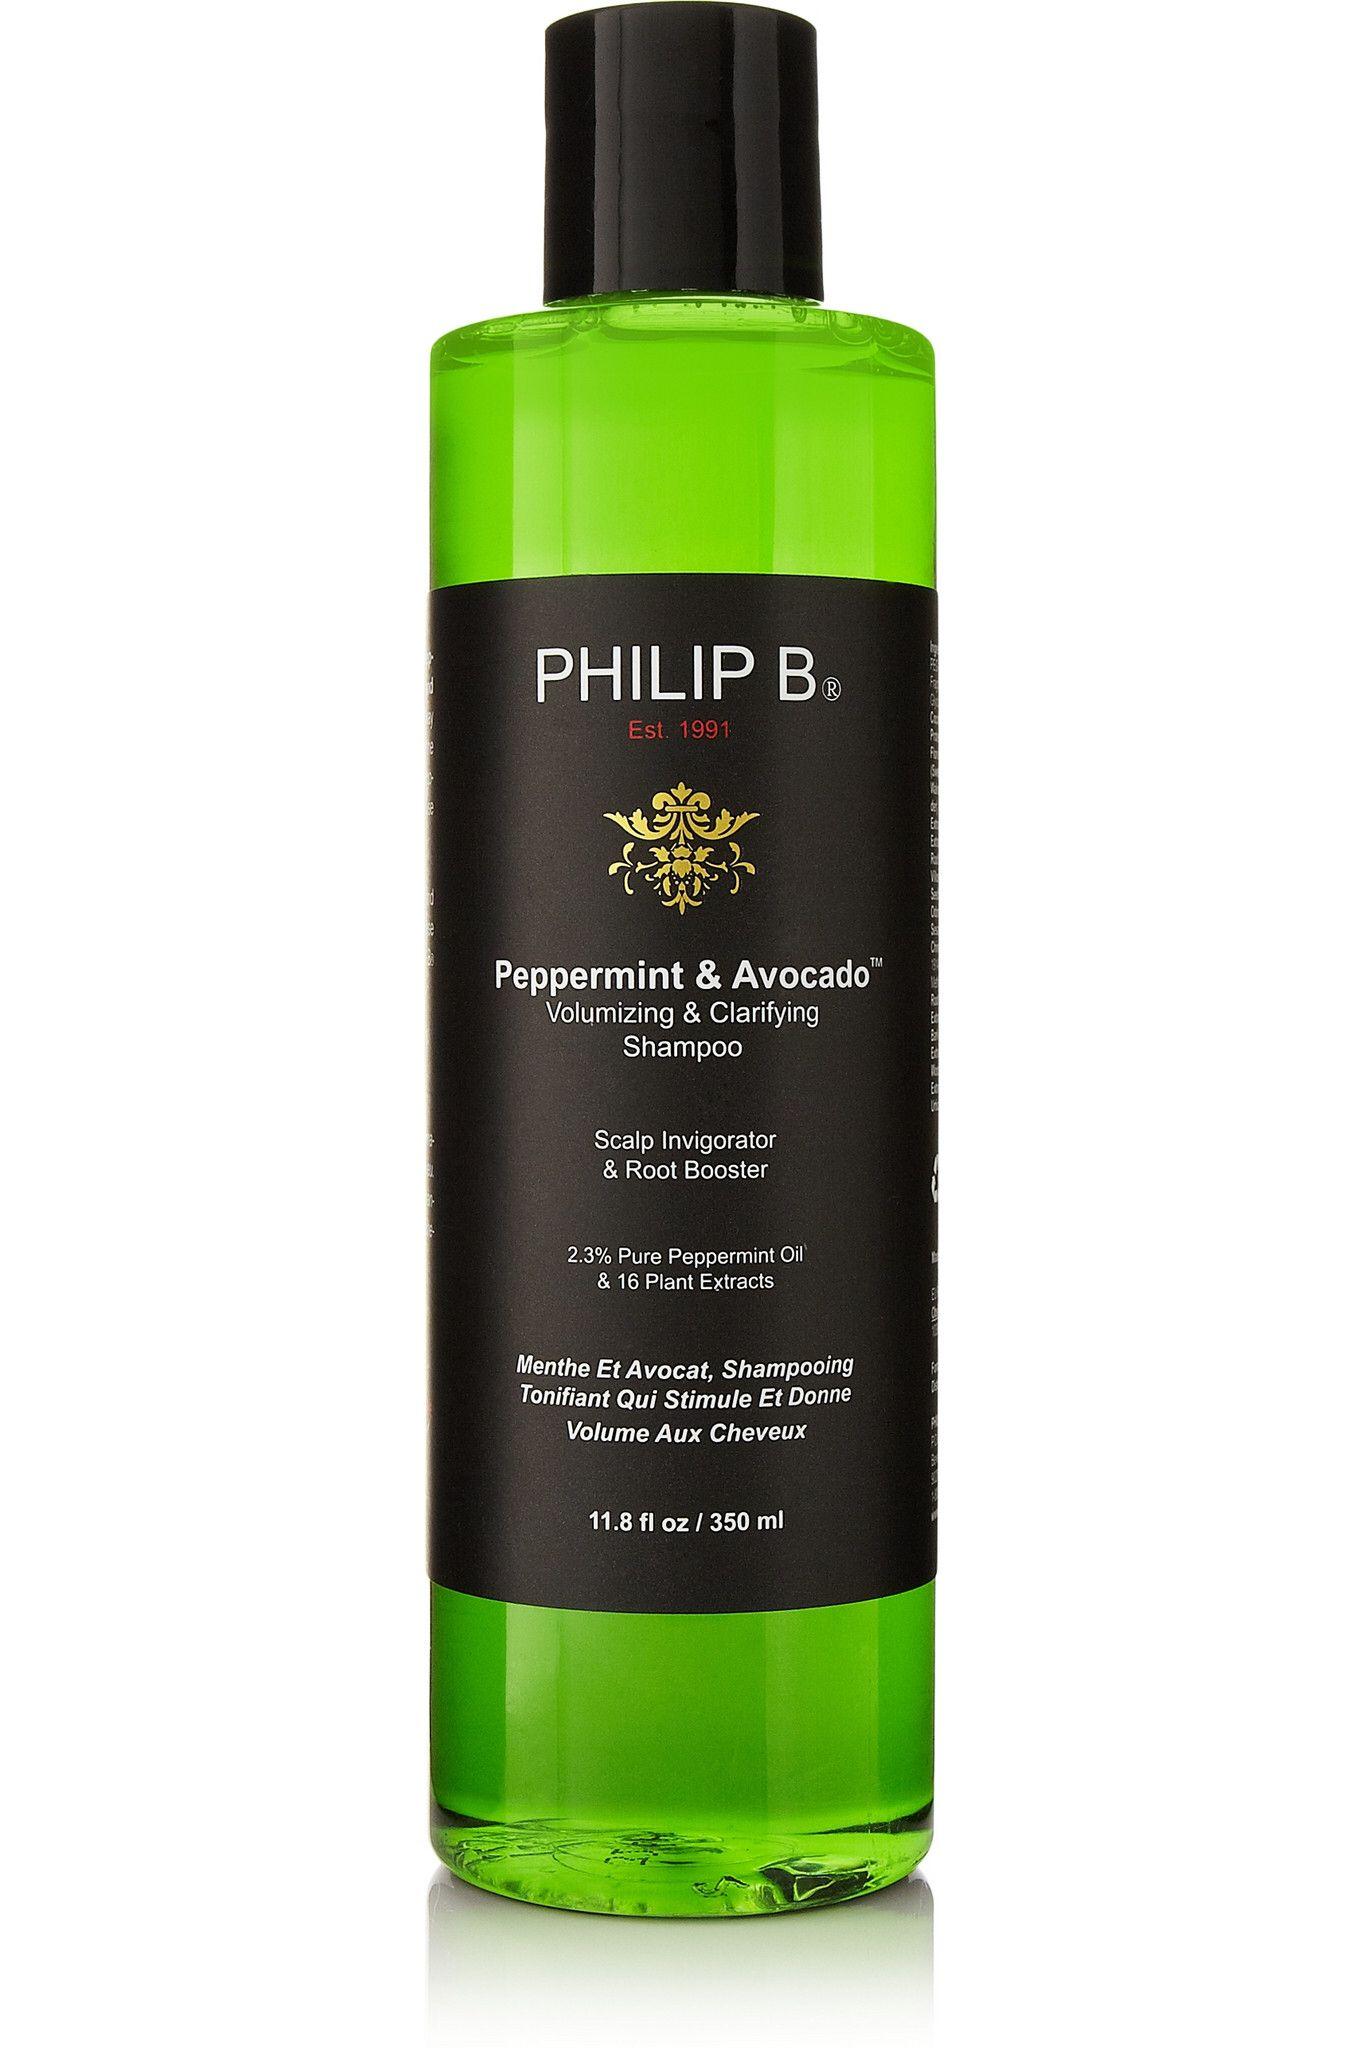 Philip B Peppermint And Avocado Volumizing Clarifying Shampoo